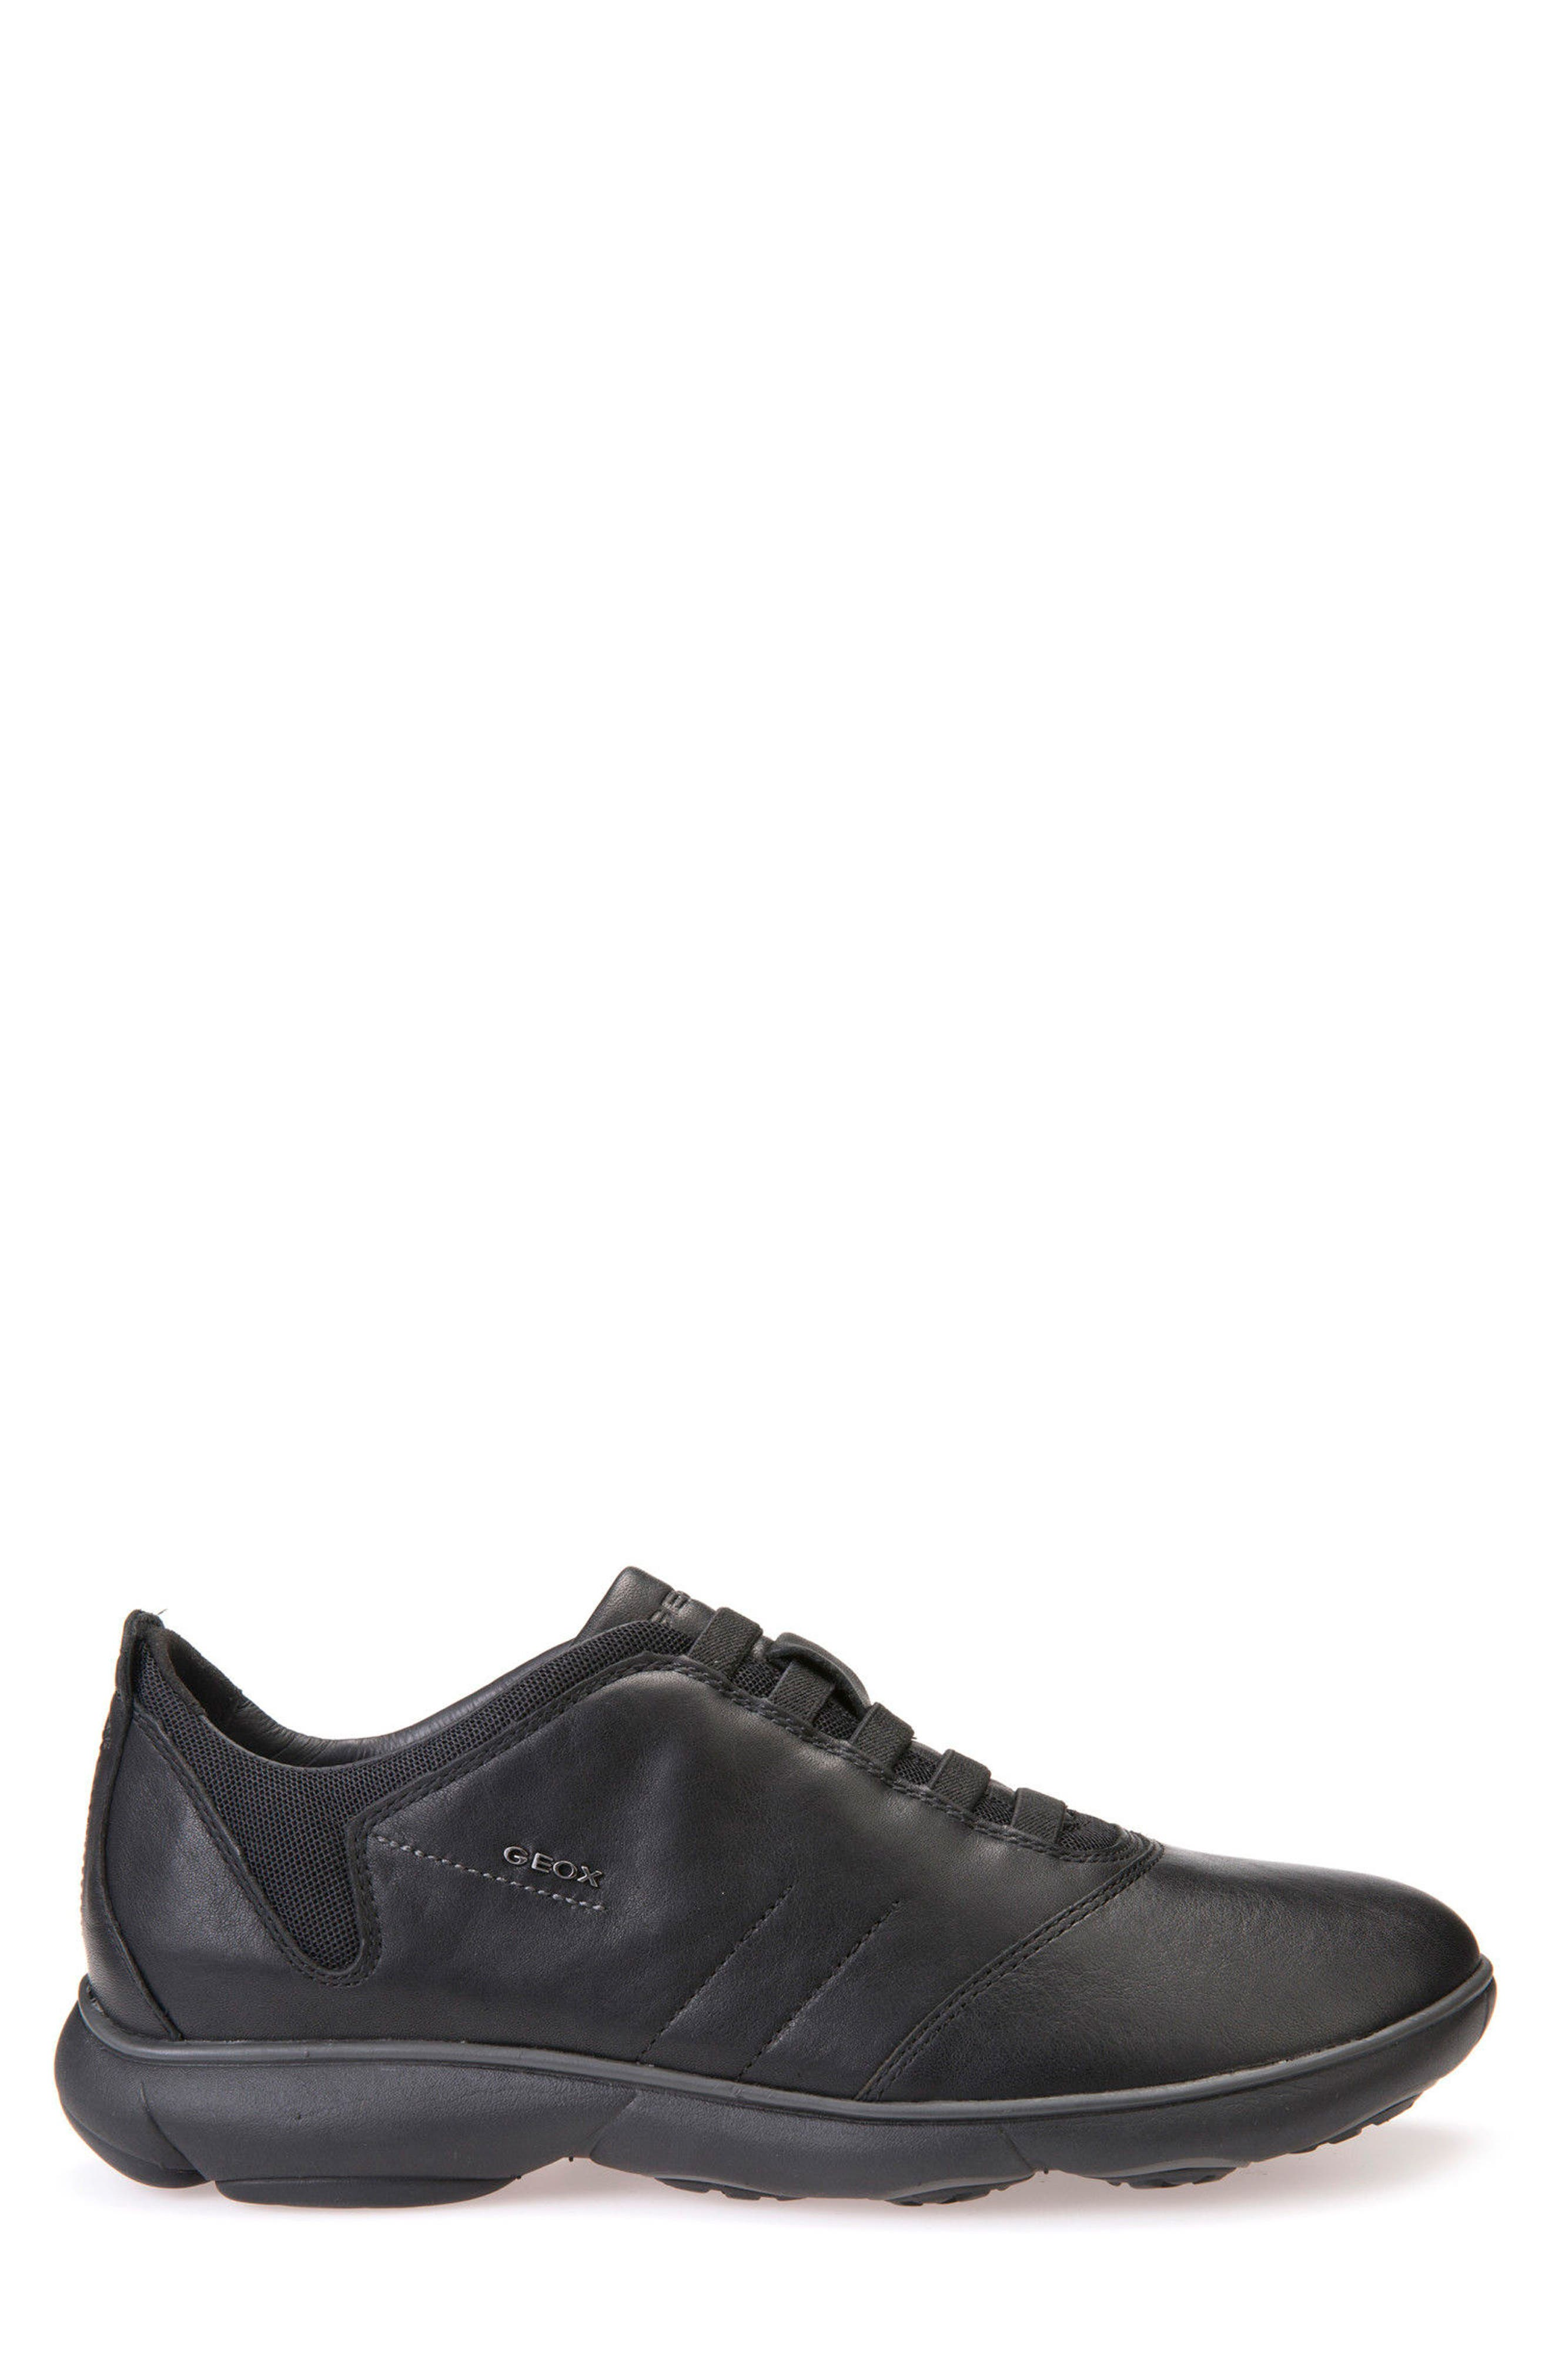 'Nebula 8' Sneaker,                             Alternate thumbnail 3, color,                             BLACK